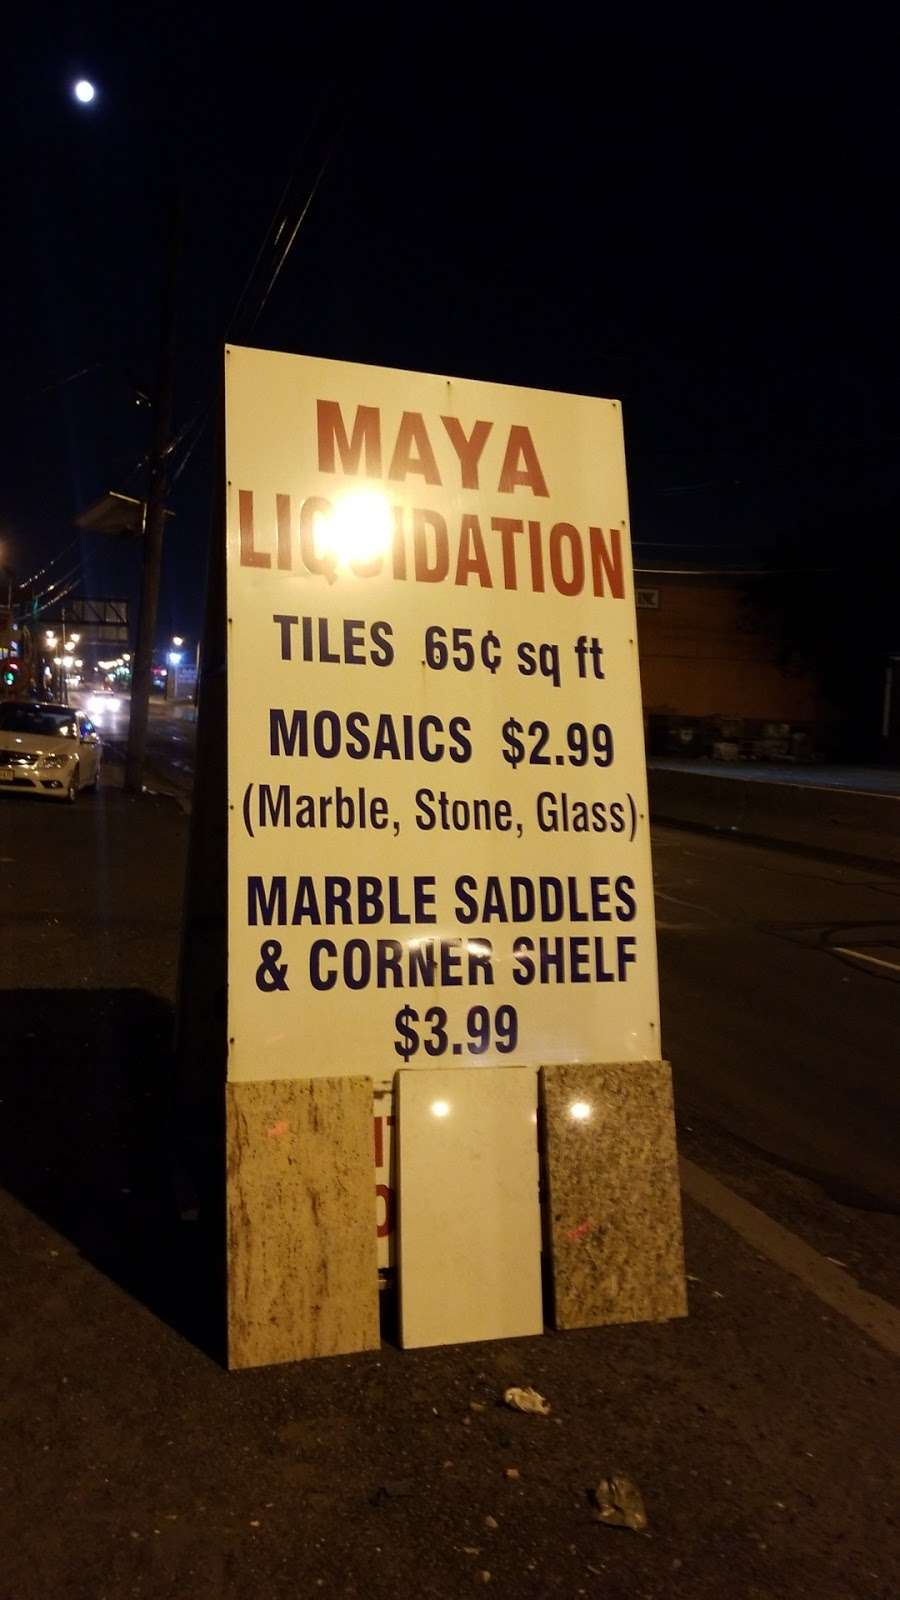 MAYA Liquidation - home goods store  | Photo 3 of 3 | Address: 746 Tonnelle Ave, Jersey City, NJ 07307, USA | Phone: (201) 238-7102